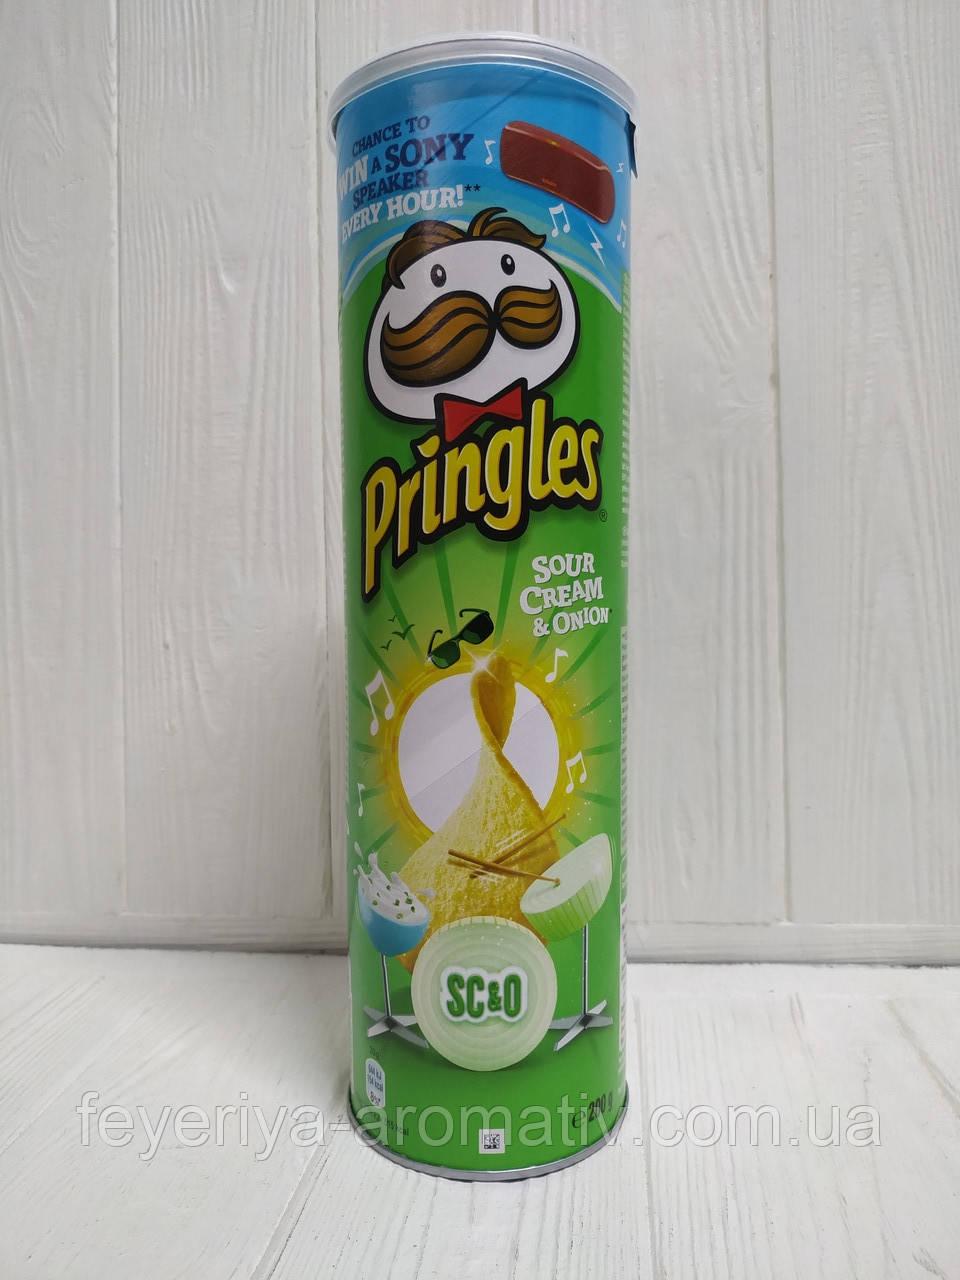 Чипсы Pringles Sour Cream&Onion, 200гр (Великобритания)